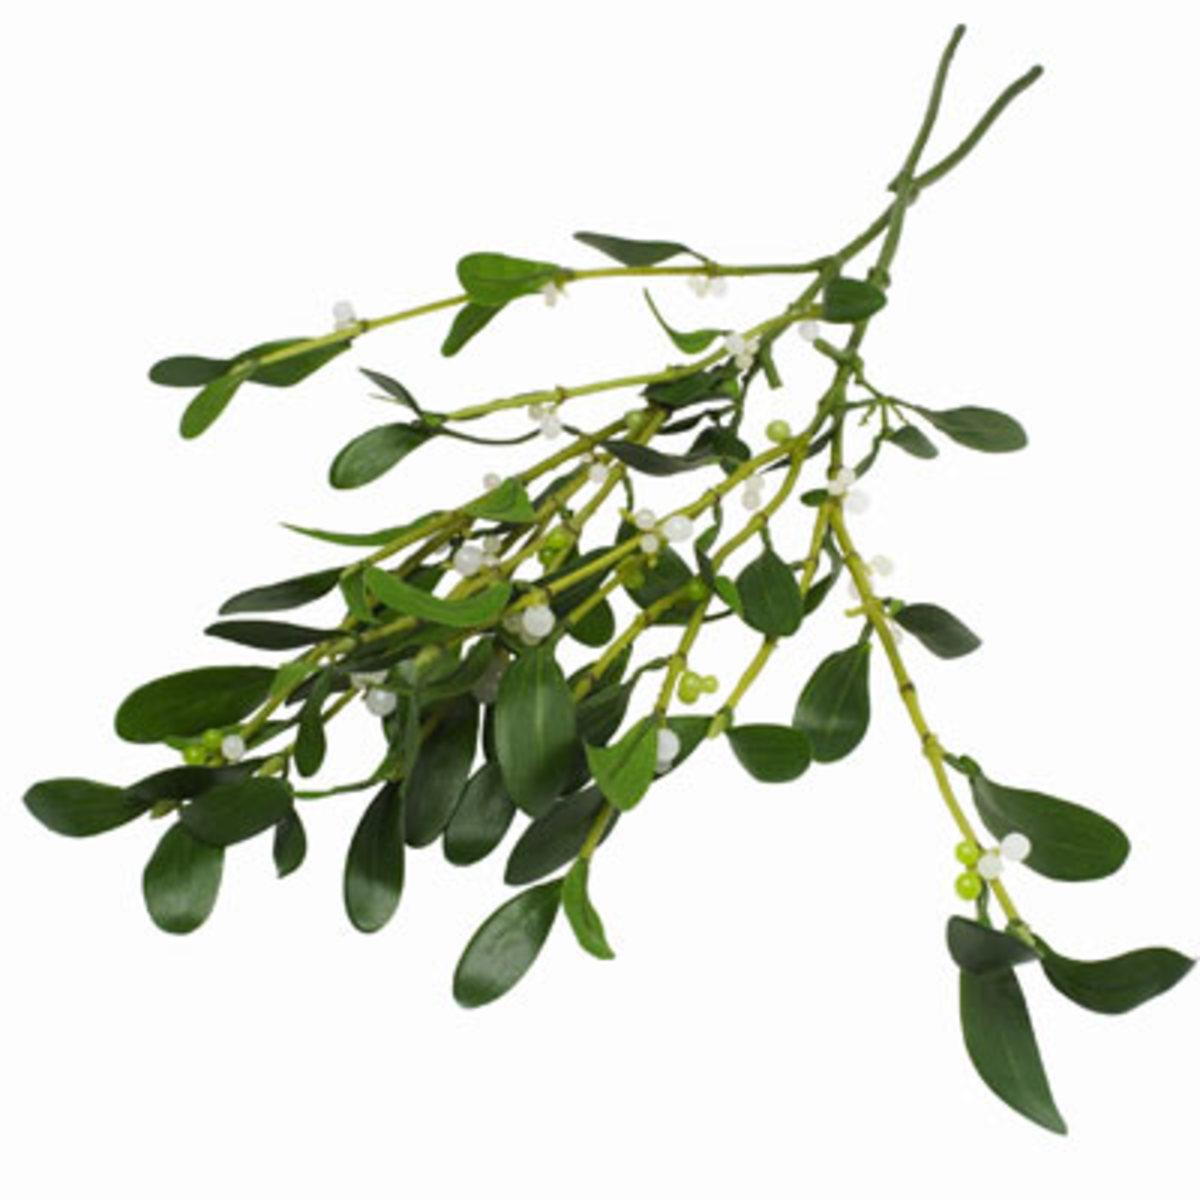 Mistletoe - Odin's younger son Baldur could only be harmed by arrows made of mistletoe twigs. Loki tricked Blind Hodr into loosing off a mistletoe arrow at Baldbur